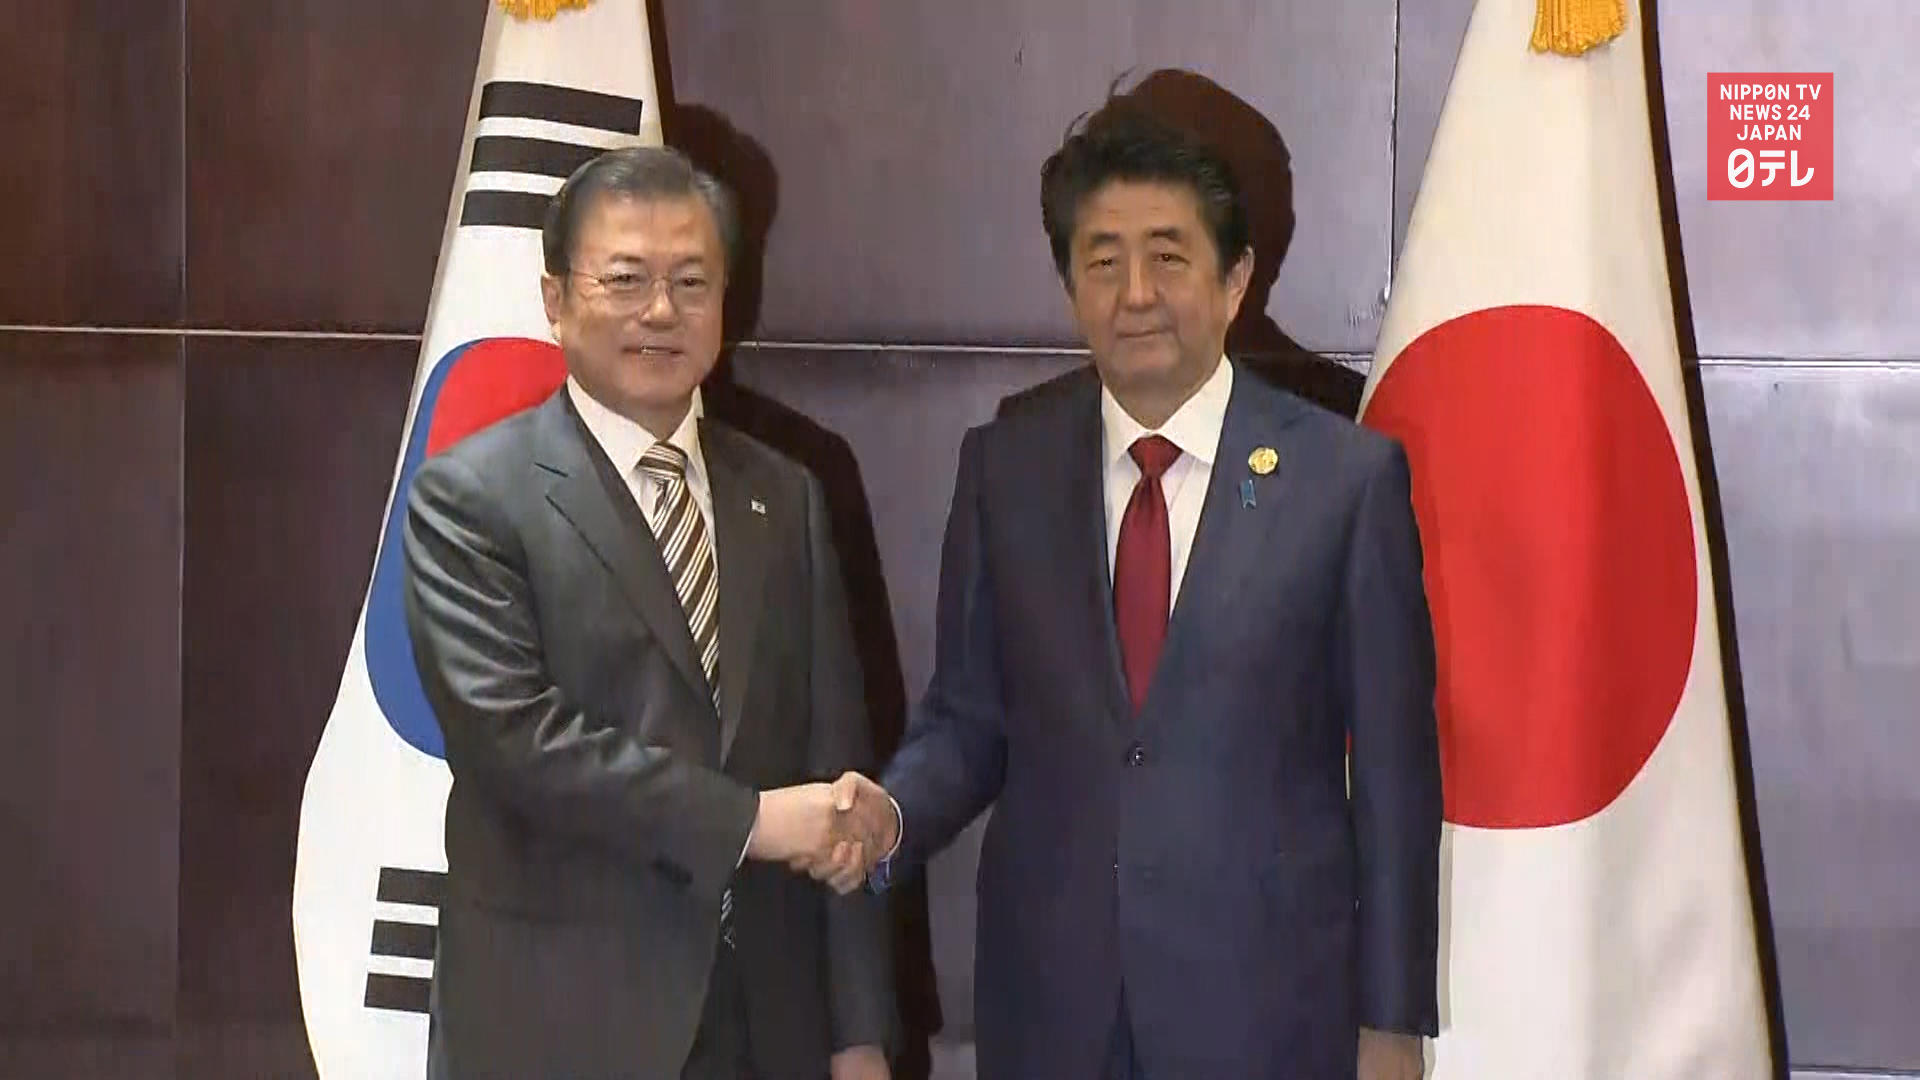 Japanese Prime Minister holds bilateral talks with South Korean President